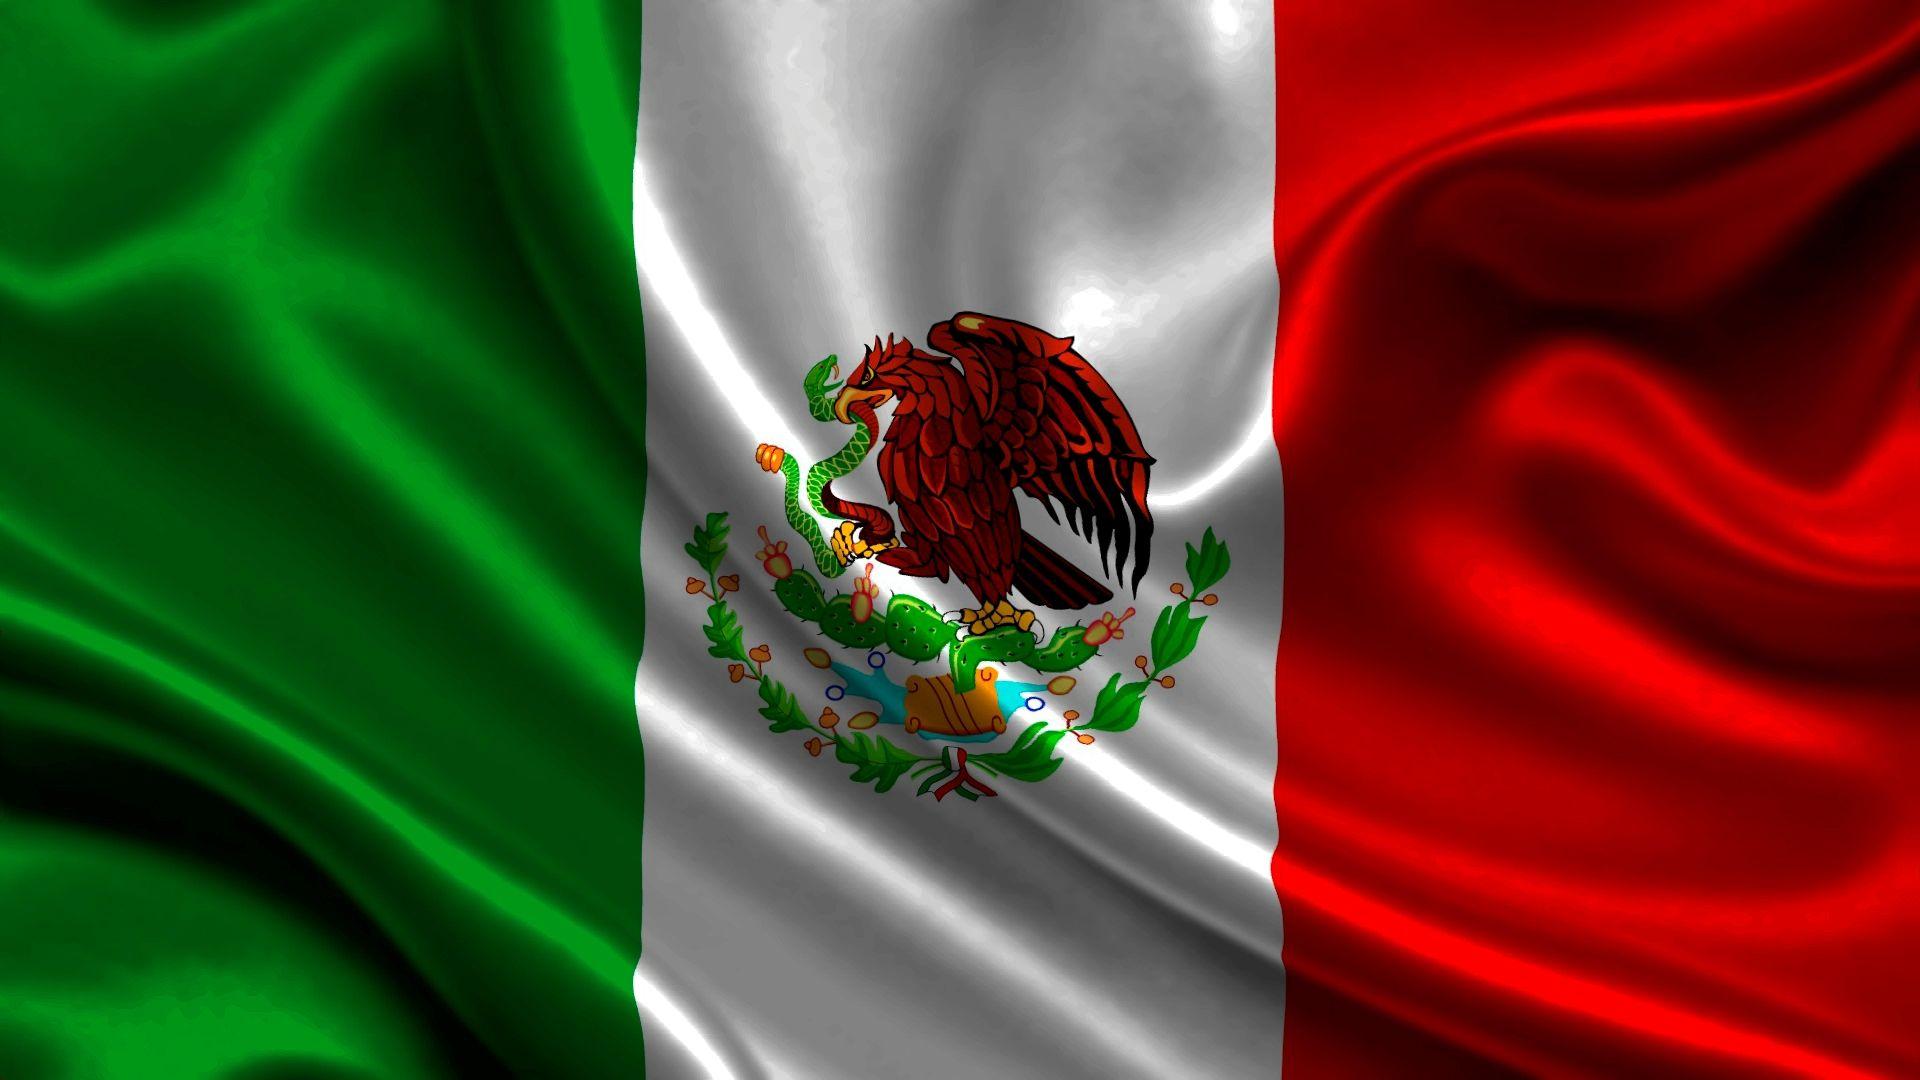 Mexico Flag Waving Flags Mexican flags, Mexico flag